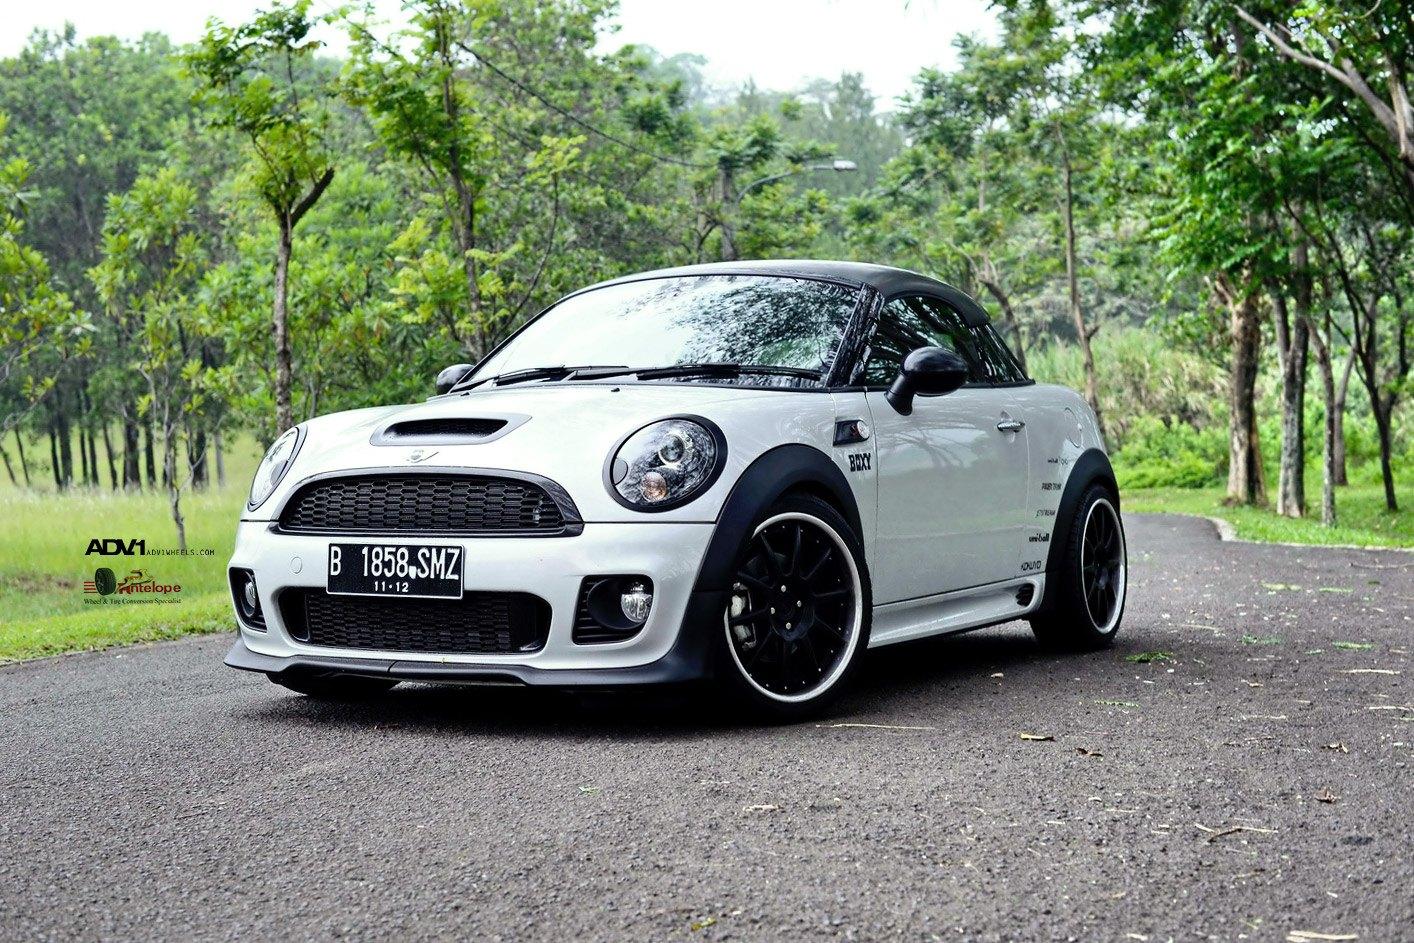 Mini Cooper Performance Parts >> Custom White Mini Cooper with Contrasting Black Accents ...